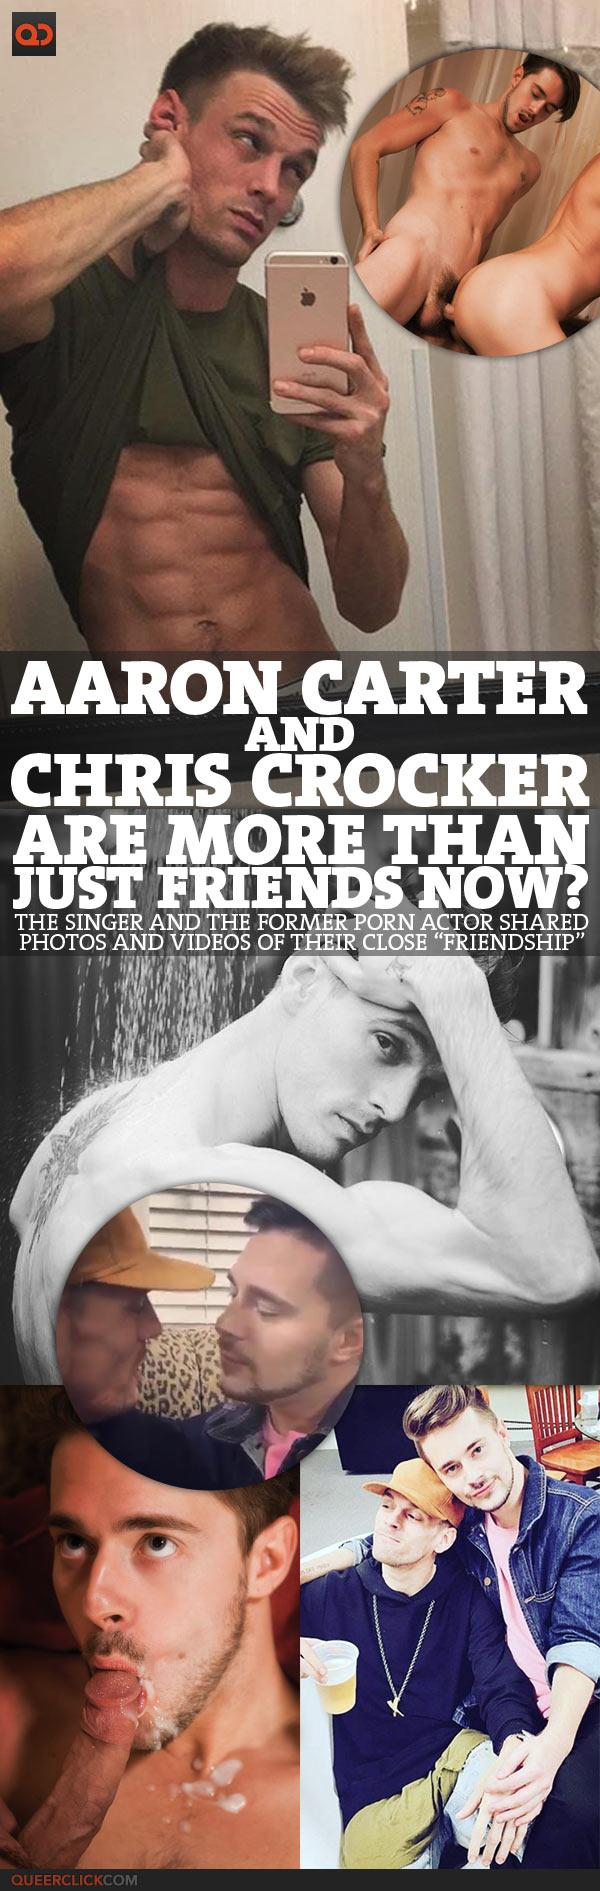 Aaron Carter Prepares To Relaunch His Career